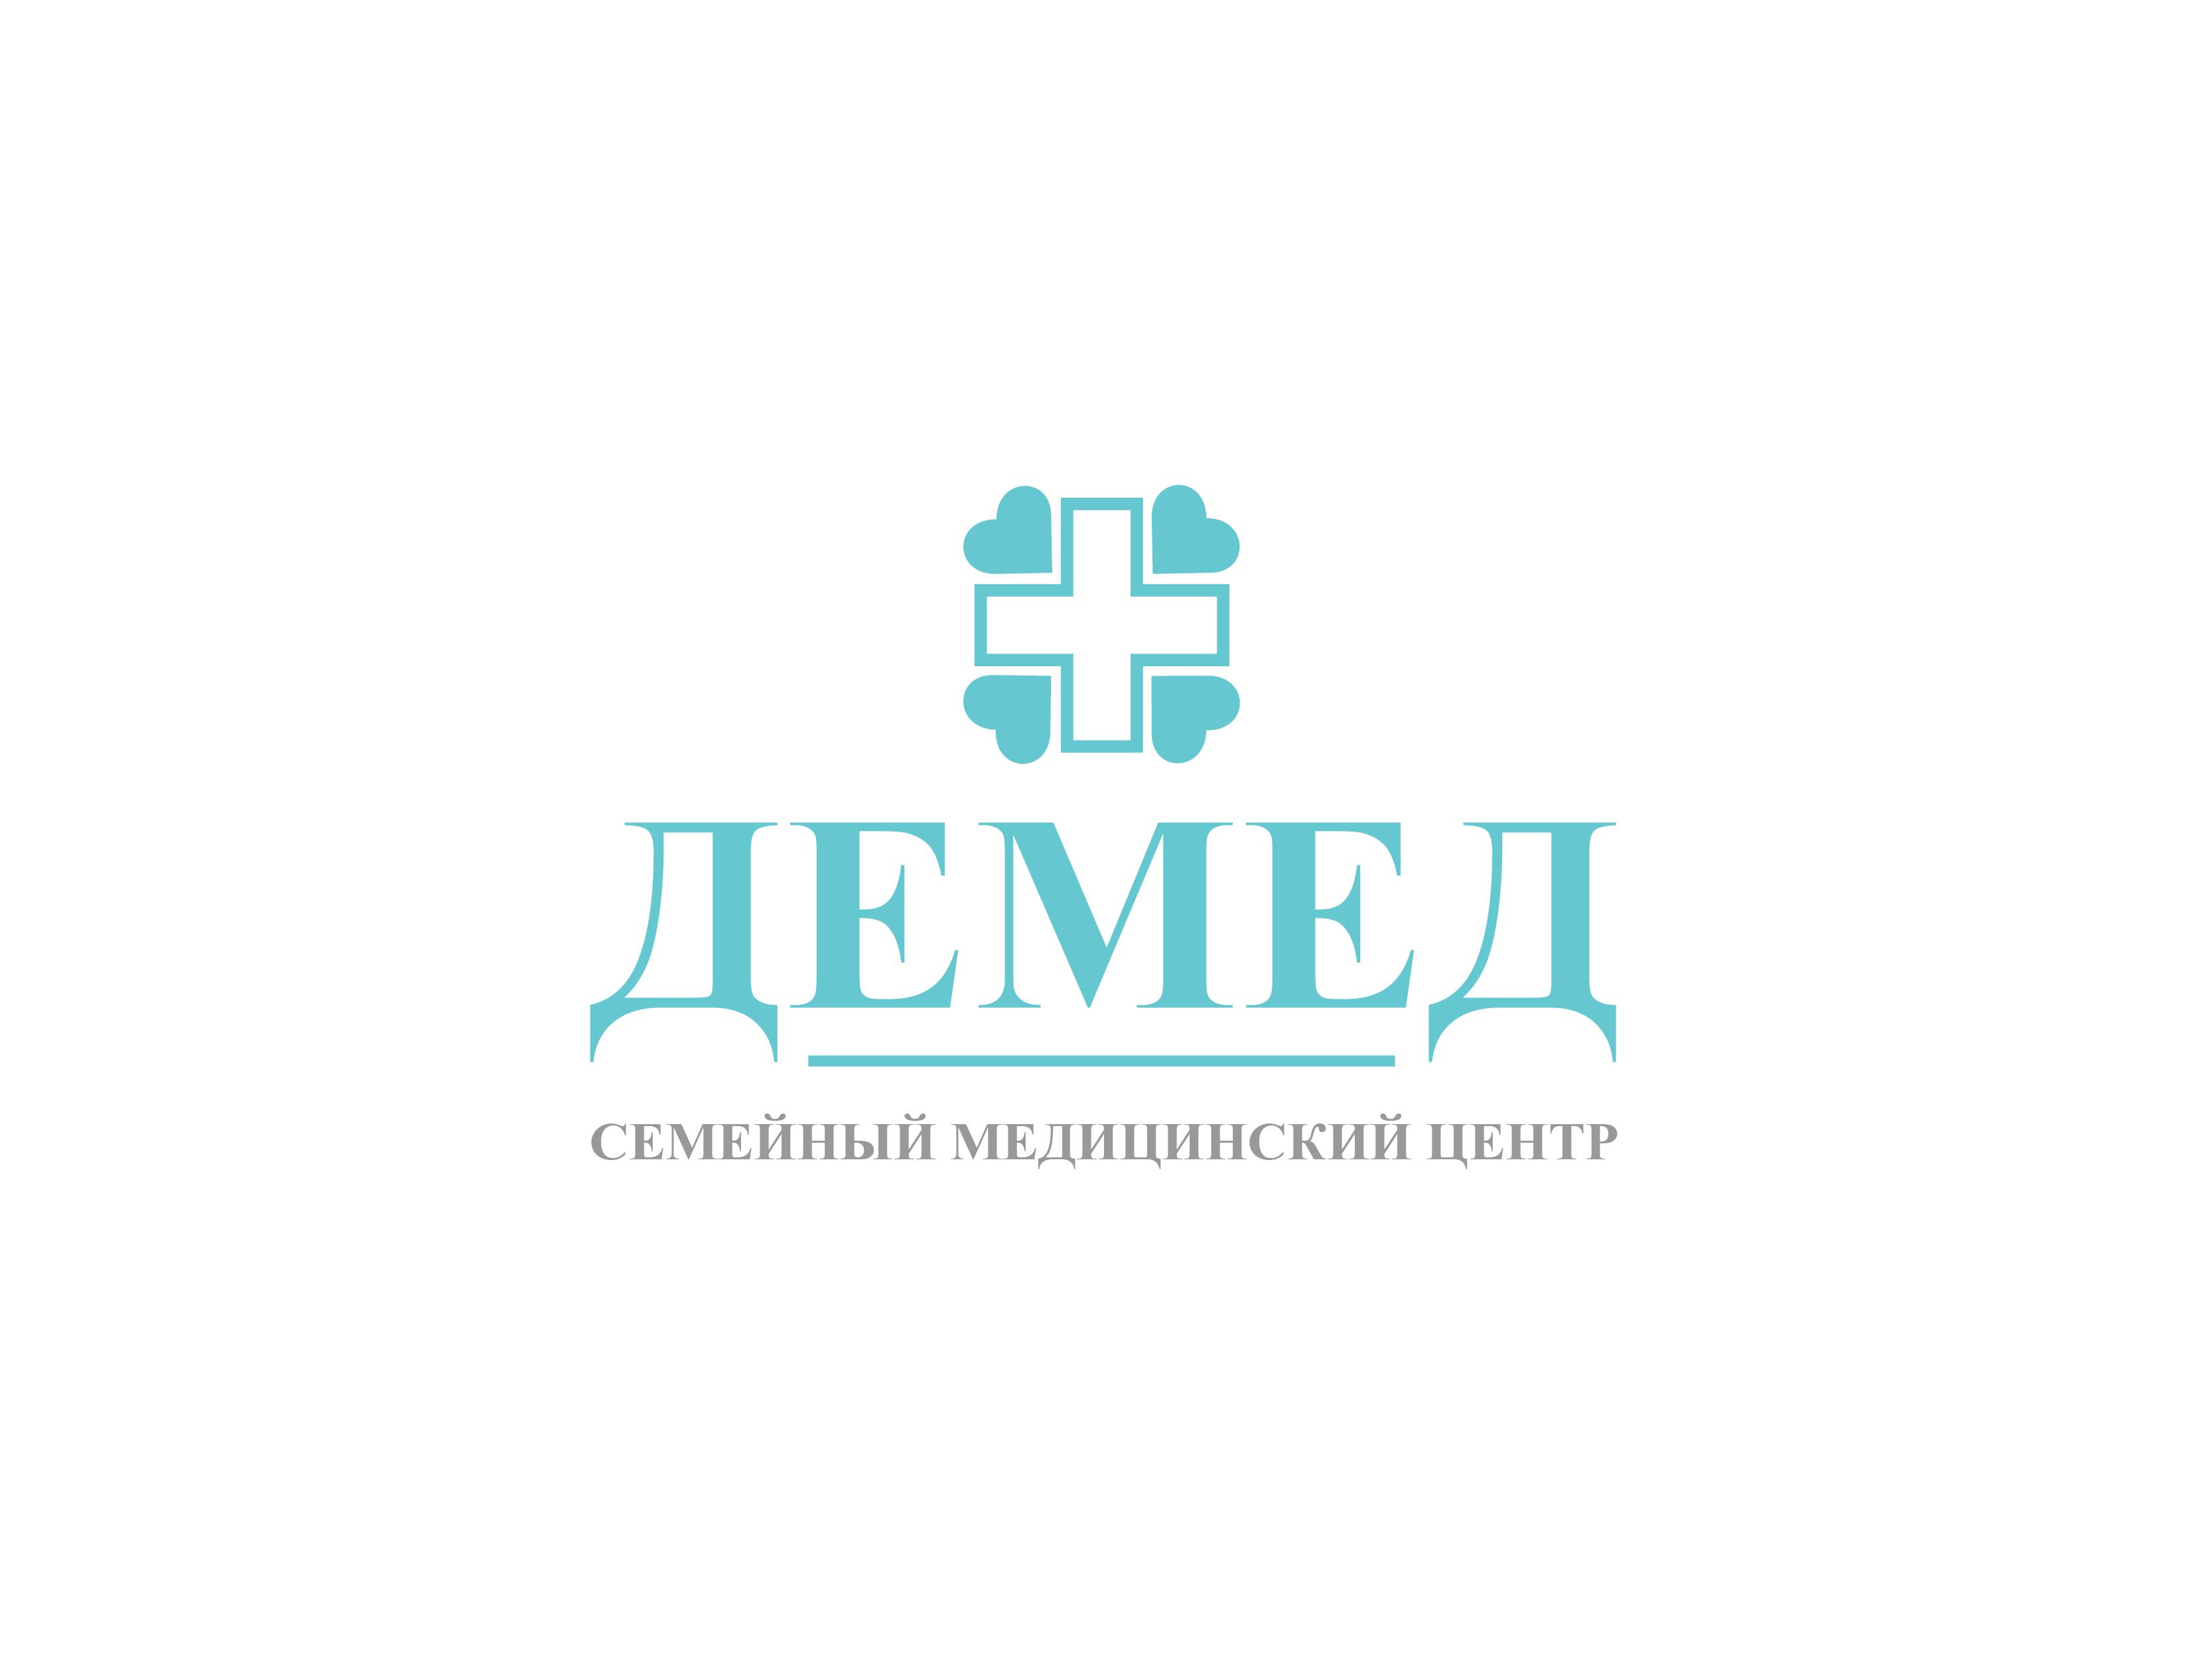 Логотип медицинского центра фото f_2785dca99be06659.png